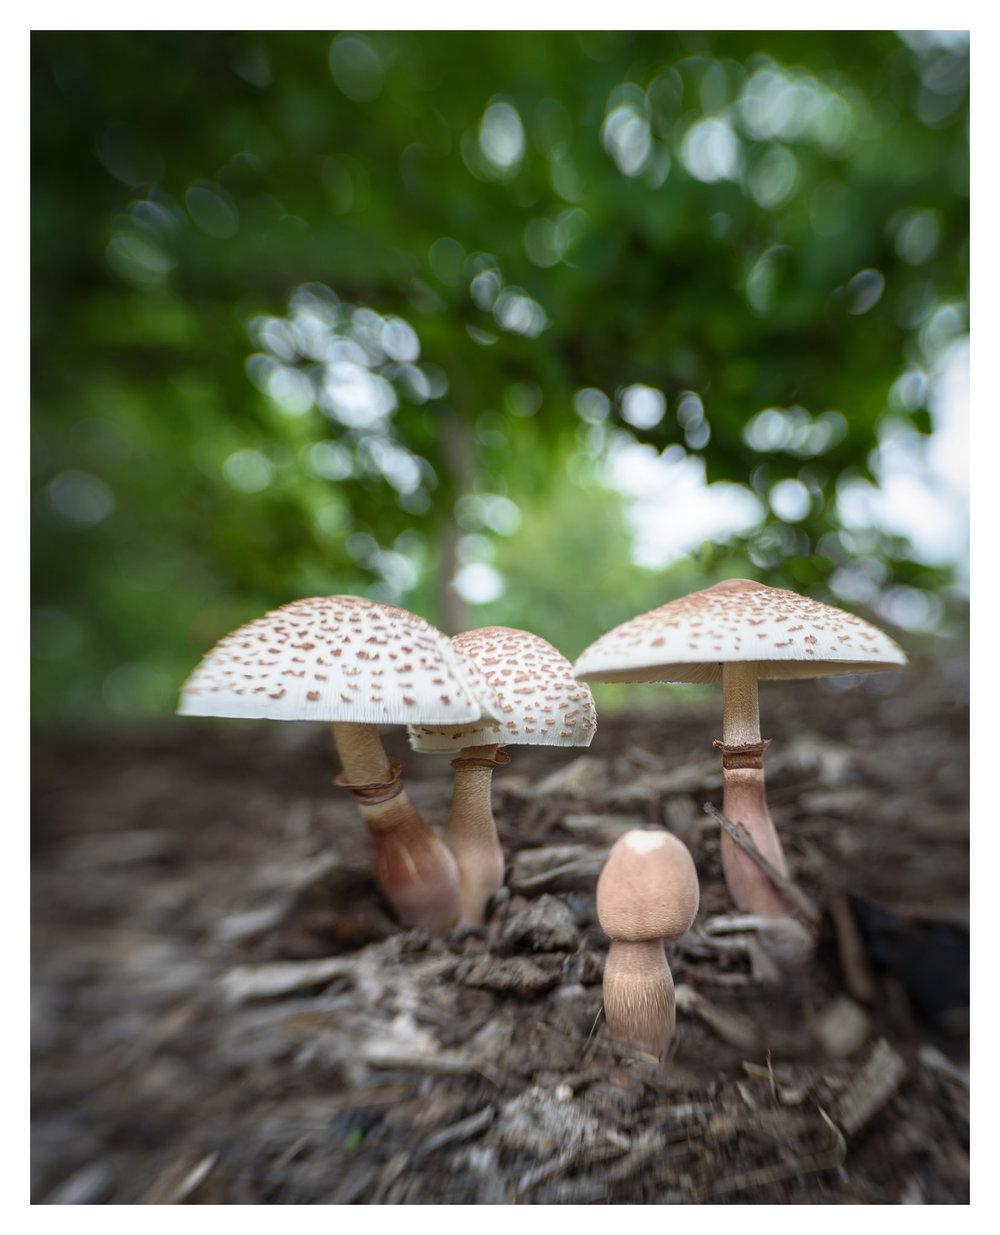 Mushrooms at Cox Arboretum MetroPark - Nikon D750 w/Lensbaby Sol 45 lens